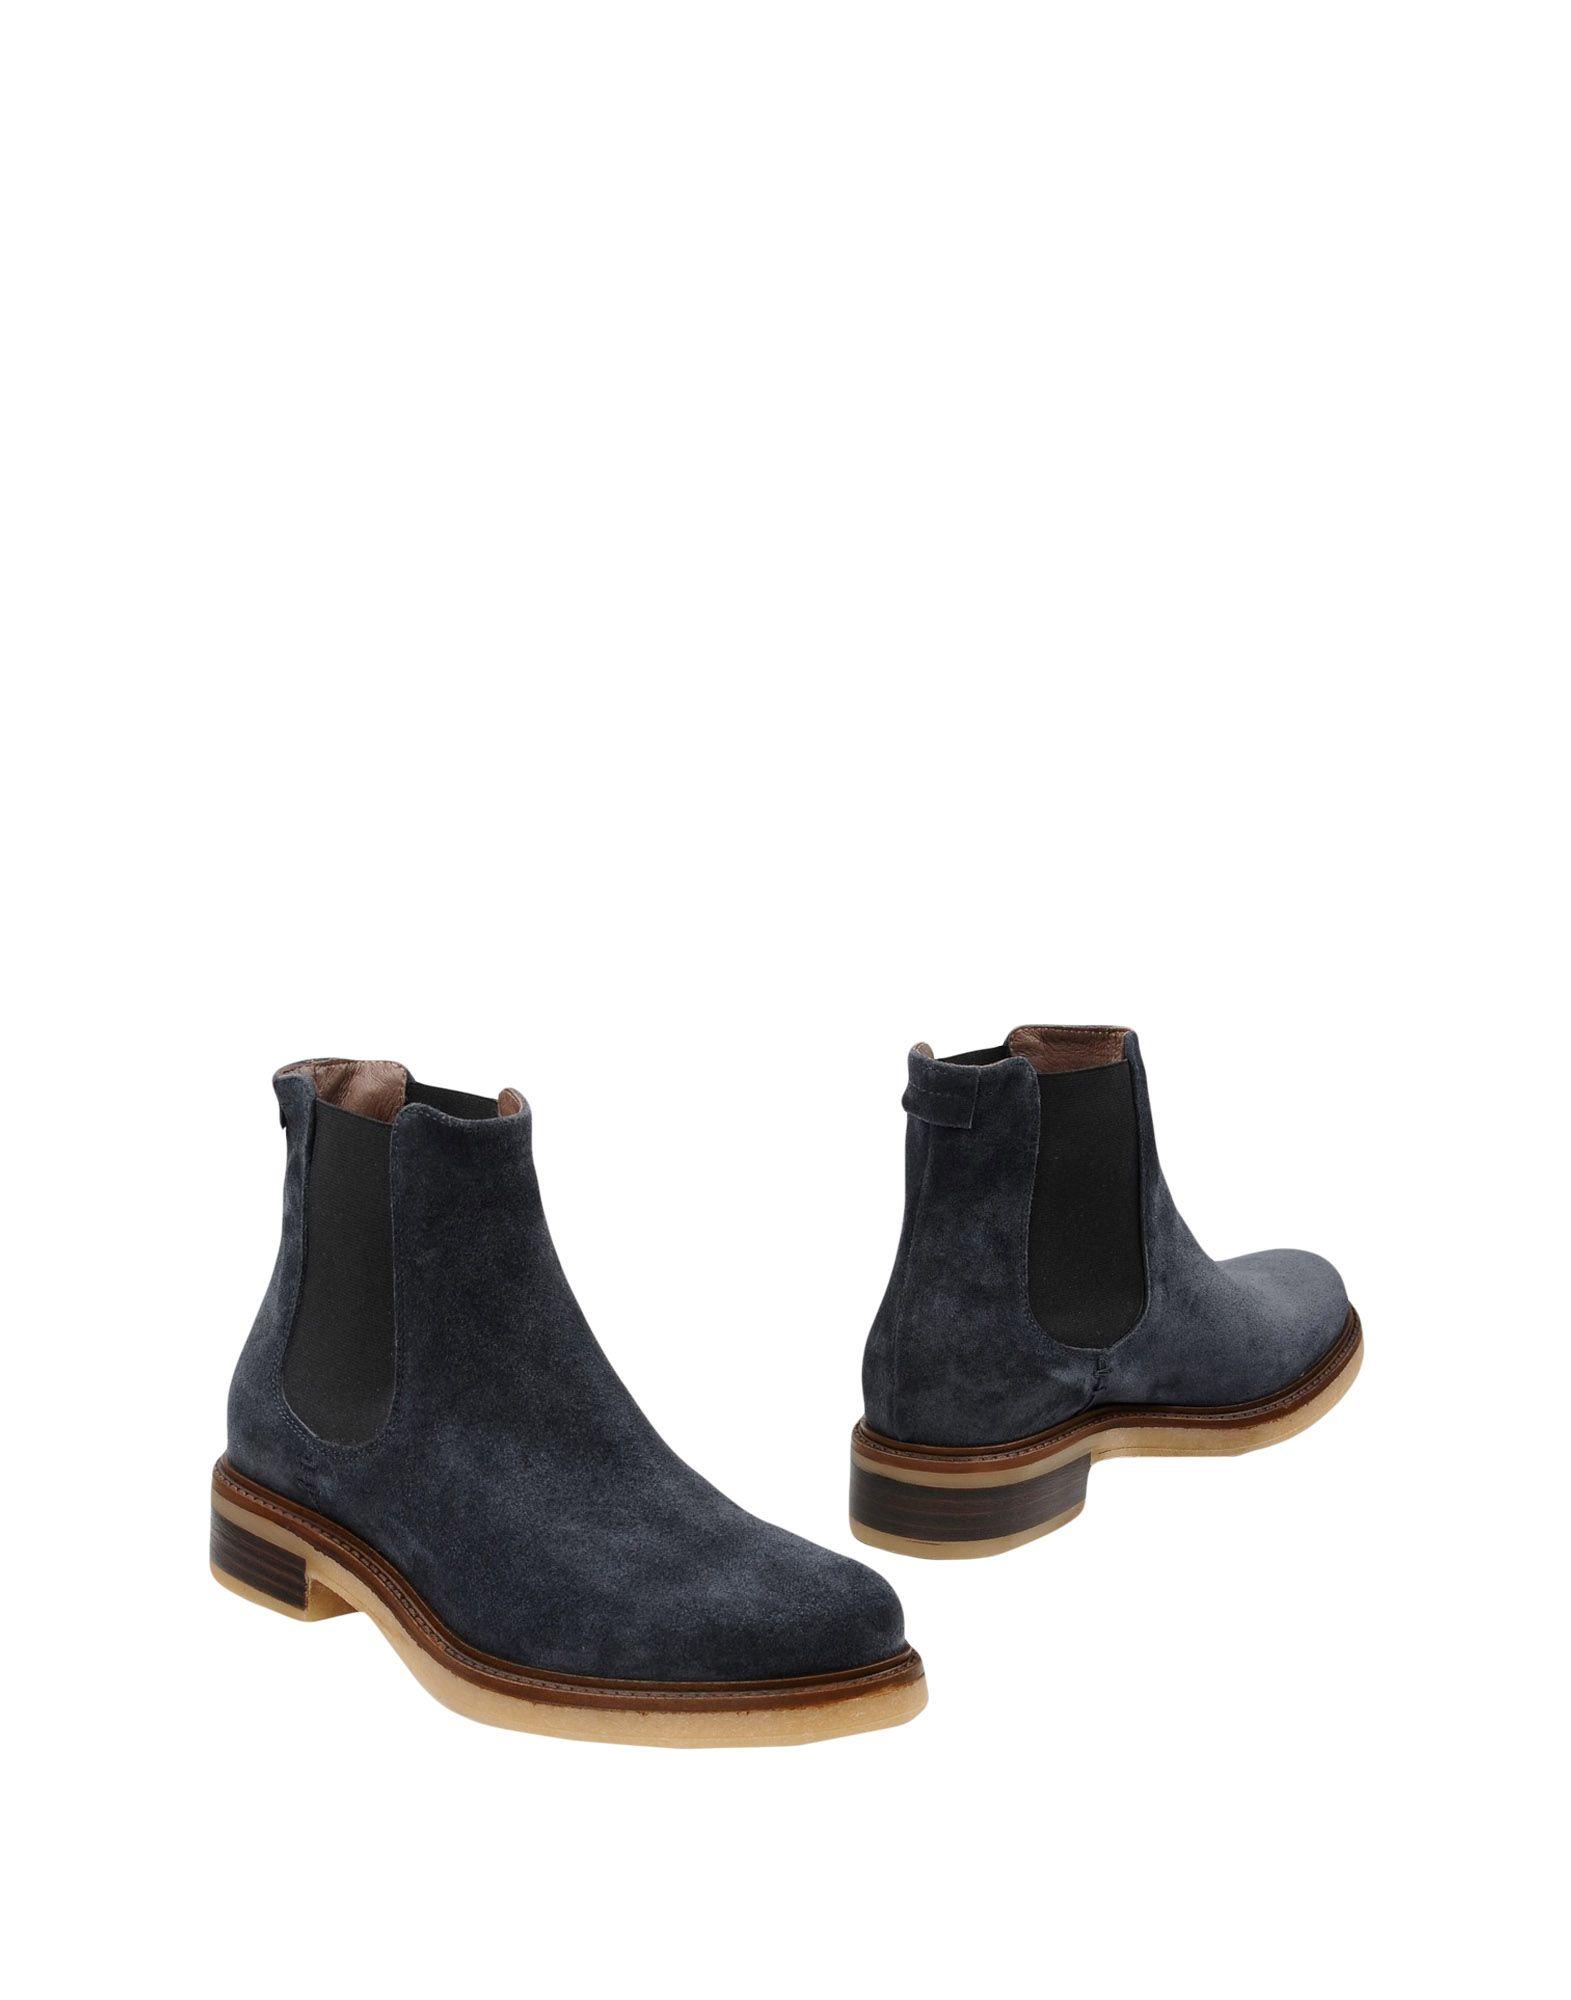 2f7d1dbf3b79 Leonardo Principi Ankle Ankle Ankle Boot - Women Leonardo Principi Ankle  Boots online on United Kingdom - 11317490AJ 956351